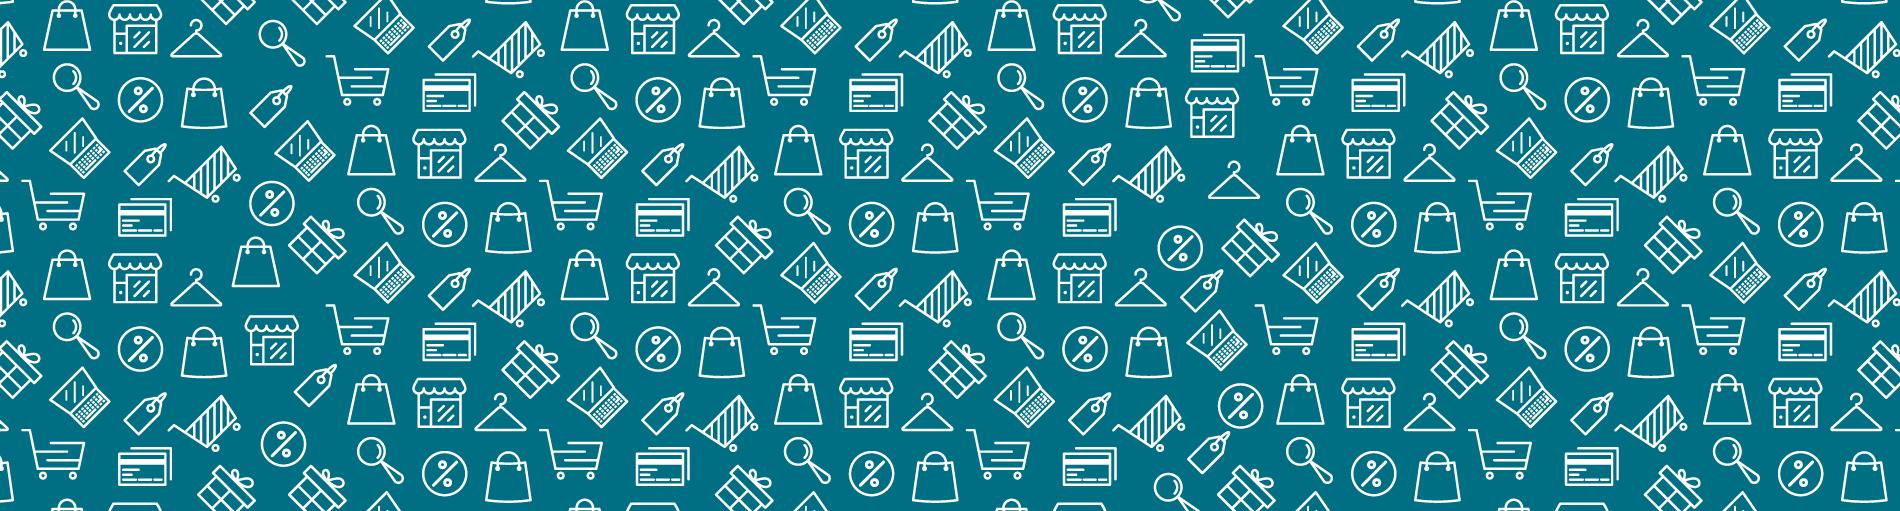 Icons zum Thema Schwarzes Brett